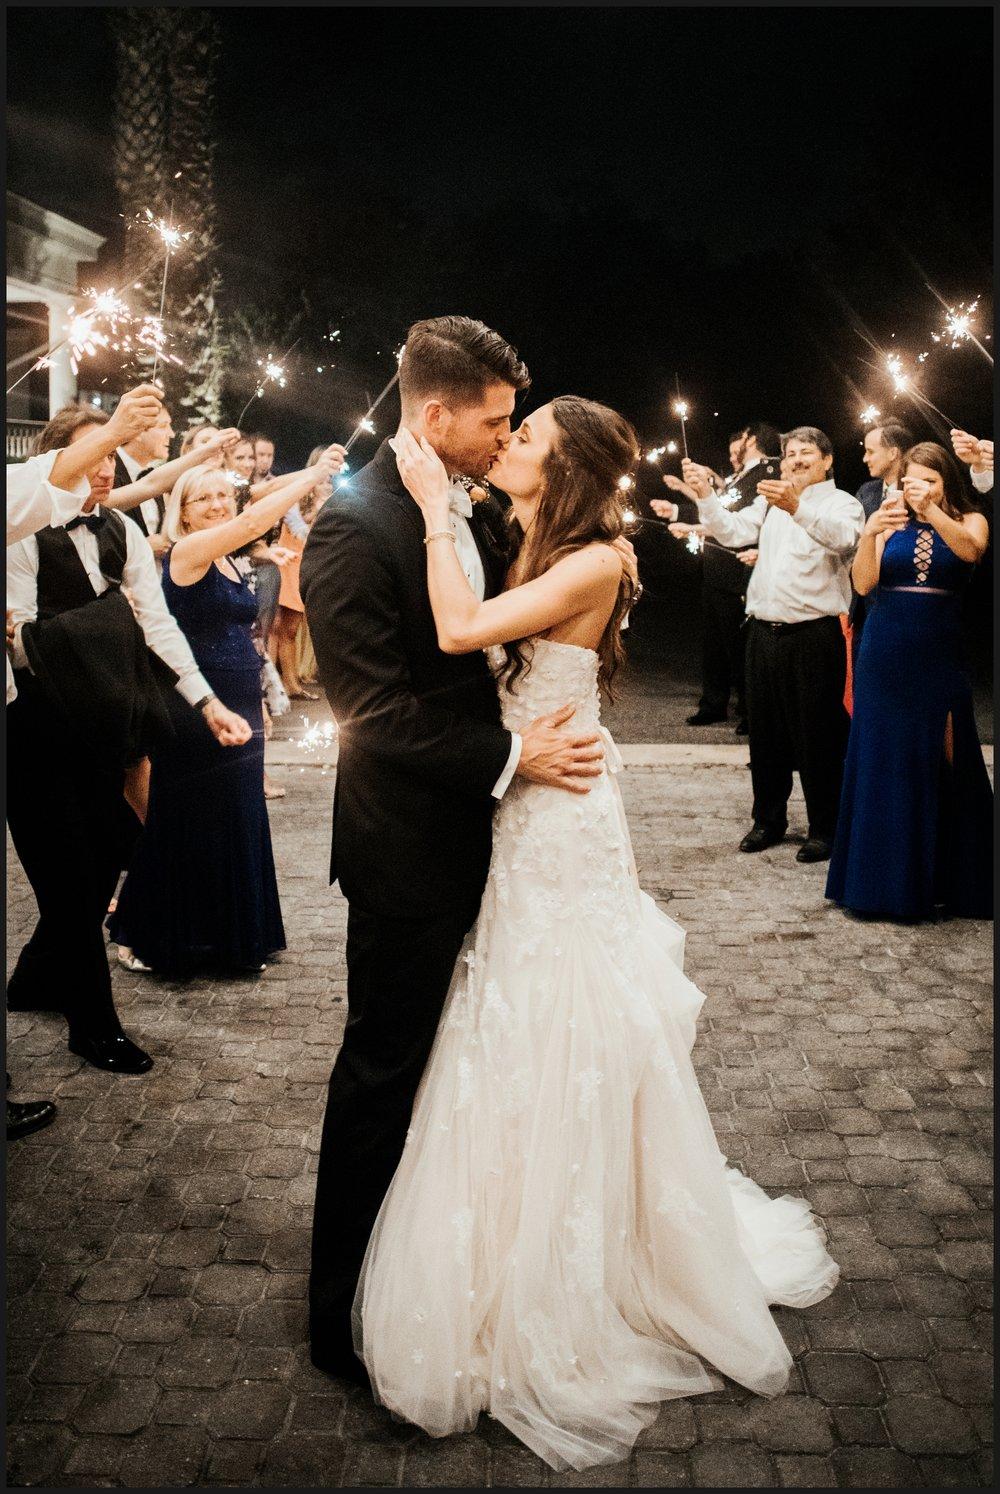 Orlando-Wedding-Photographer-destination-wedding-photographer-florida-wedding-photographer-hawaii-wedding-photographer_0263.jpg